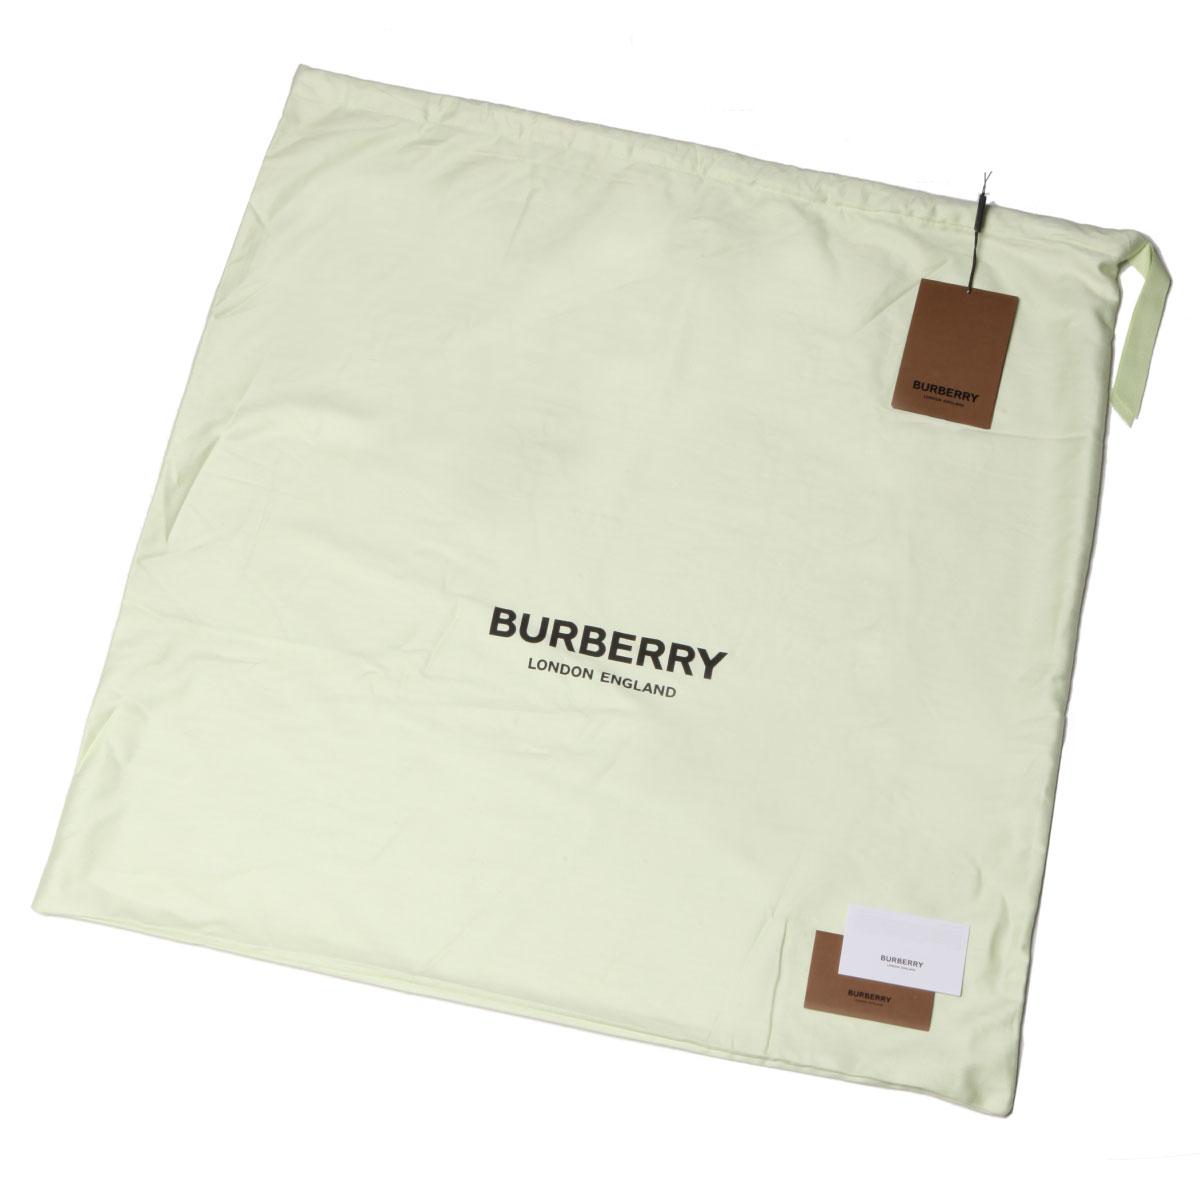 BURBERRY バーバリー | バックパック ラージ | NEVIS ネヴィス